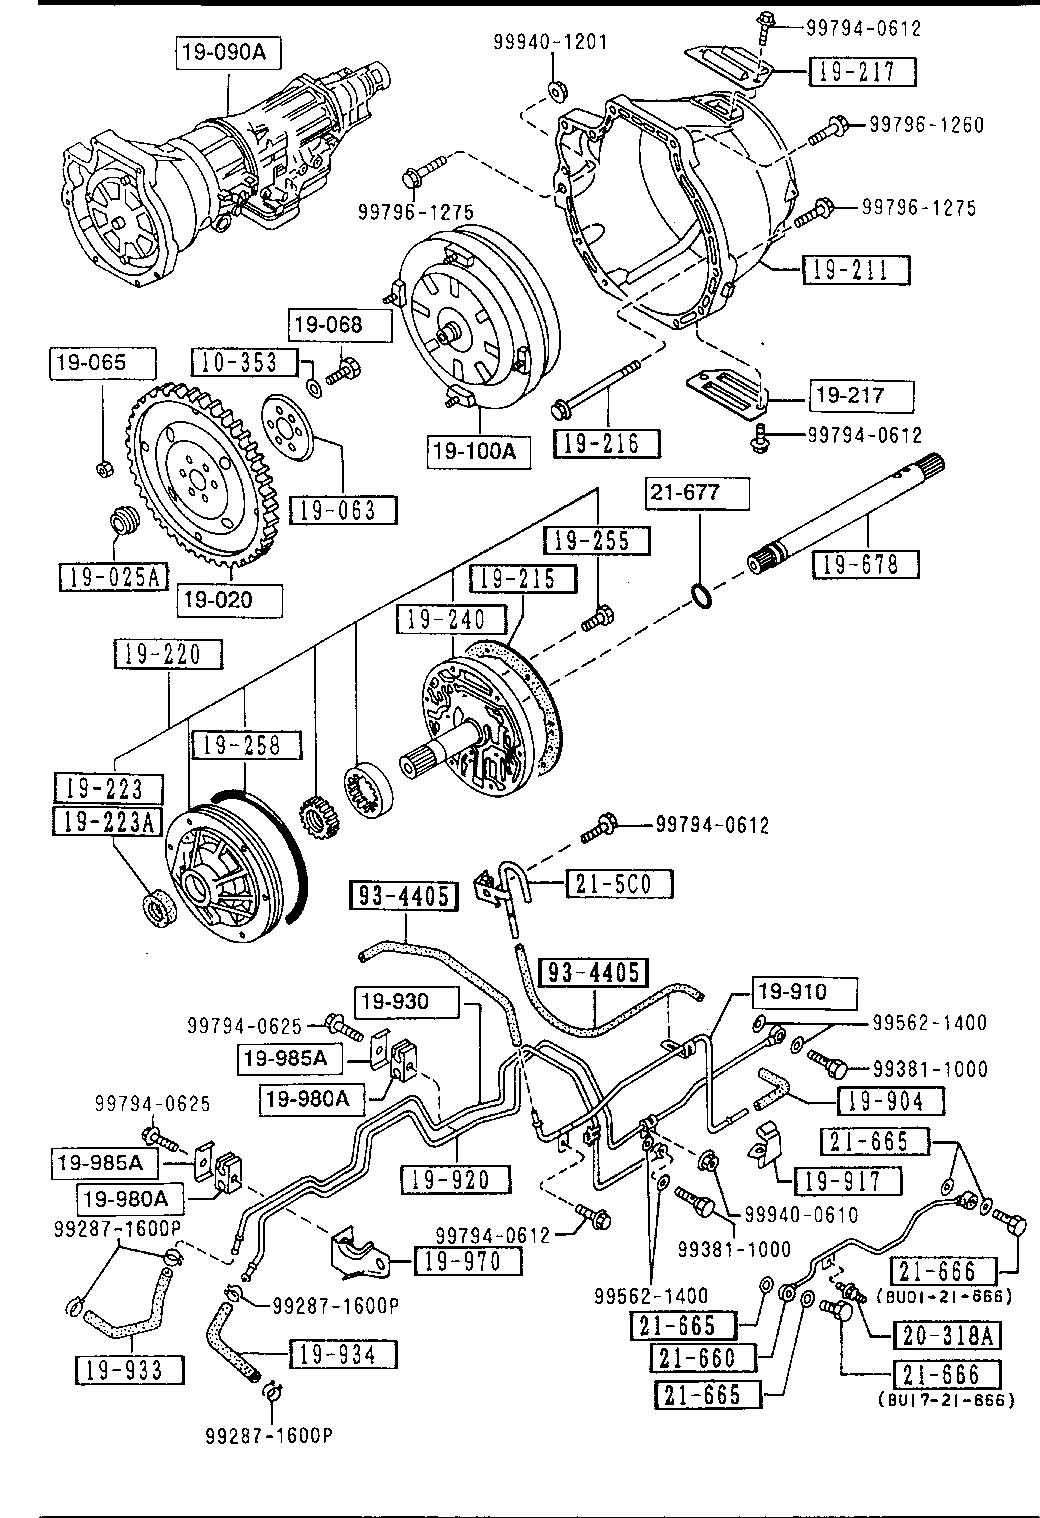 Usa 1991 Miata Gasoline Engine Transmission 1910 Automatic Transmission Torque Converter Oil Pump Pipings Catcar Info